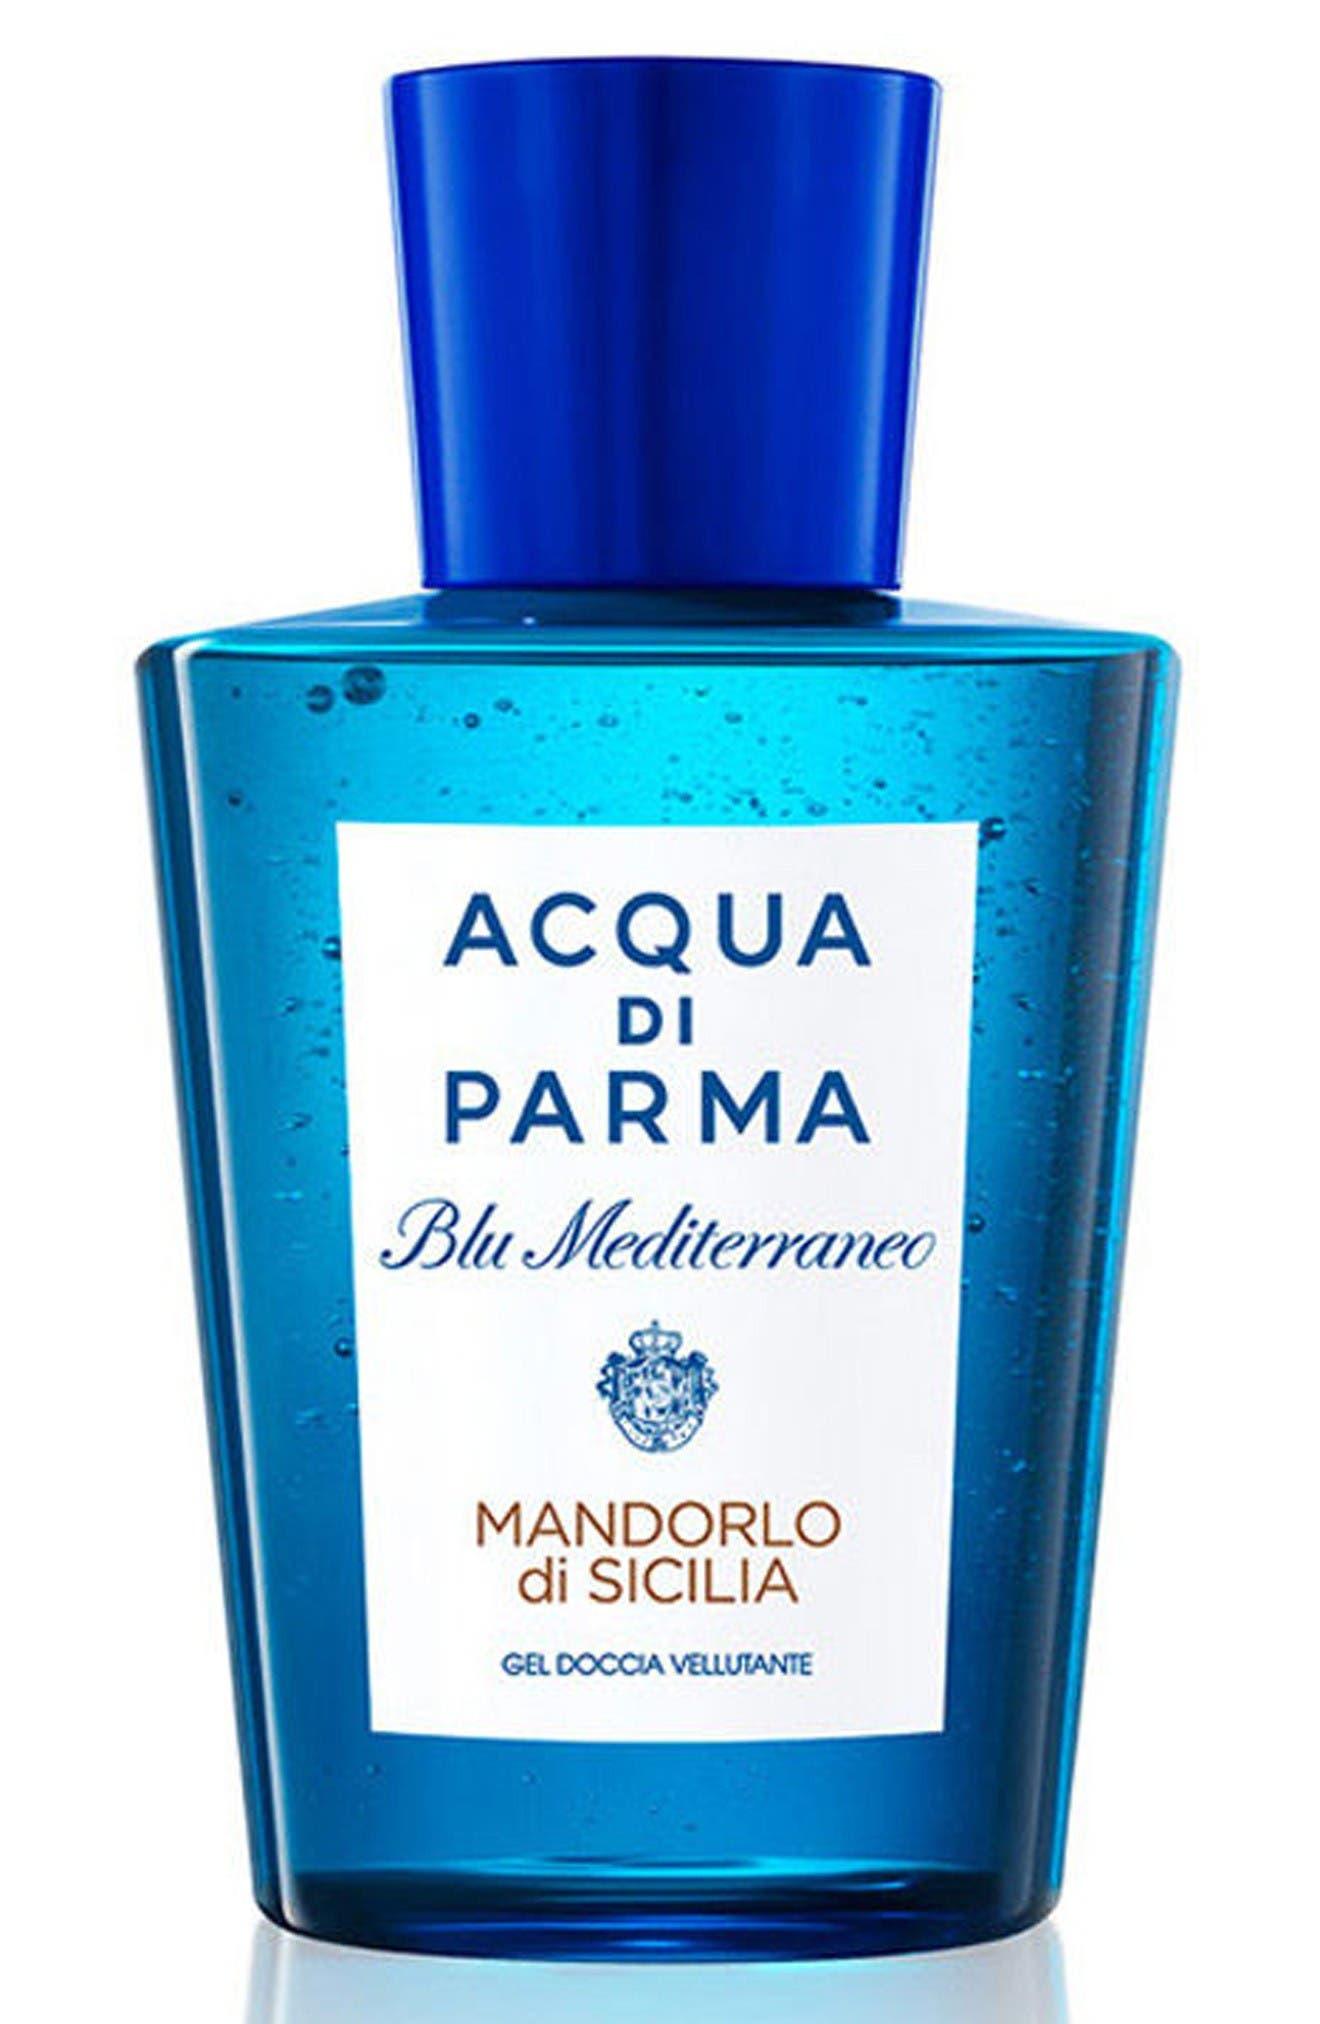 Main Image - Acqua di Parma 'Blu Mediterraneo - Mandorlo di Sicilia' Shower Gel